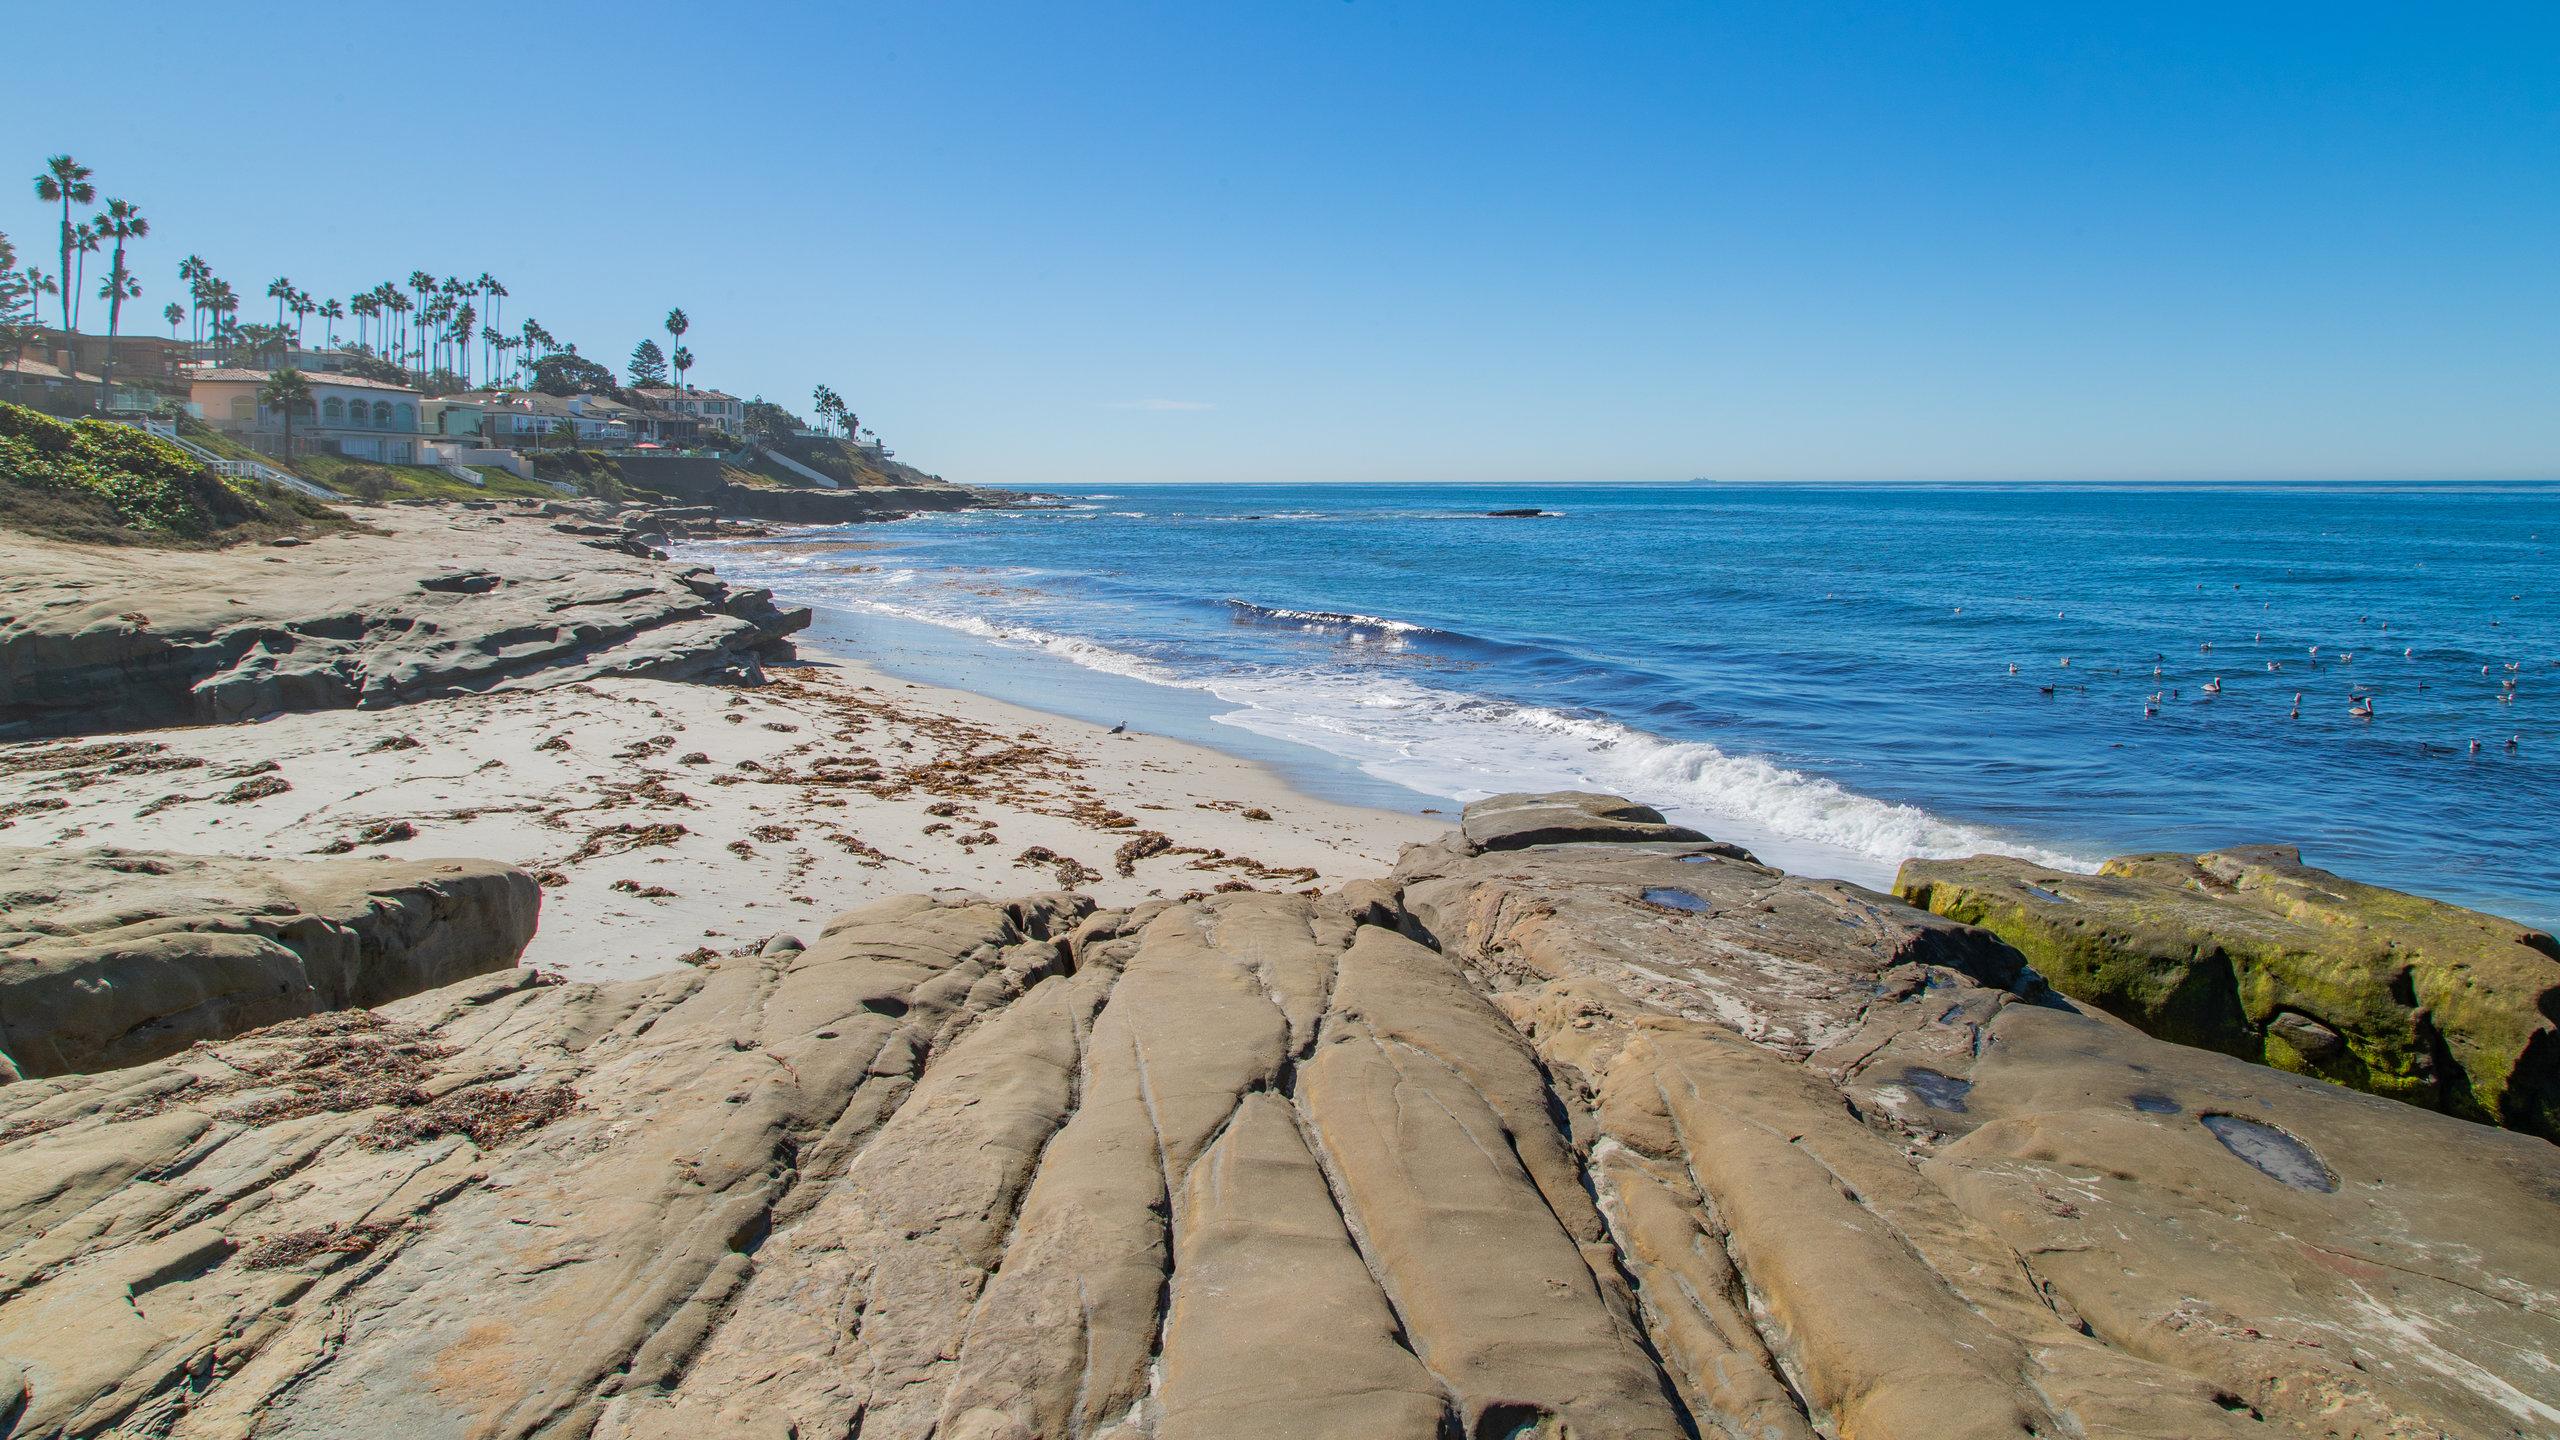 Windansea Beach, La Jolla, California, United States of America